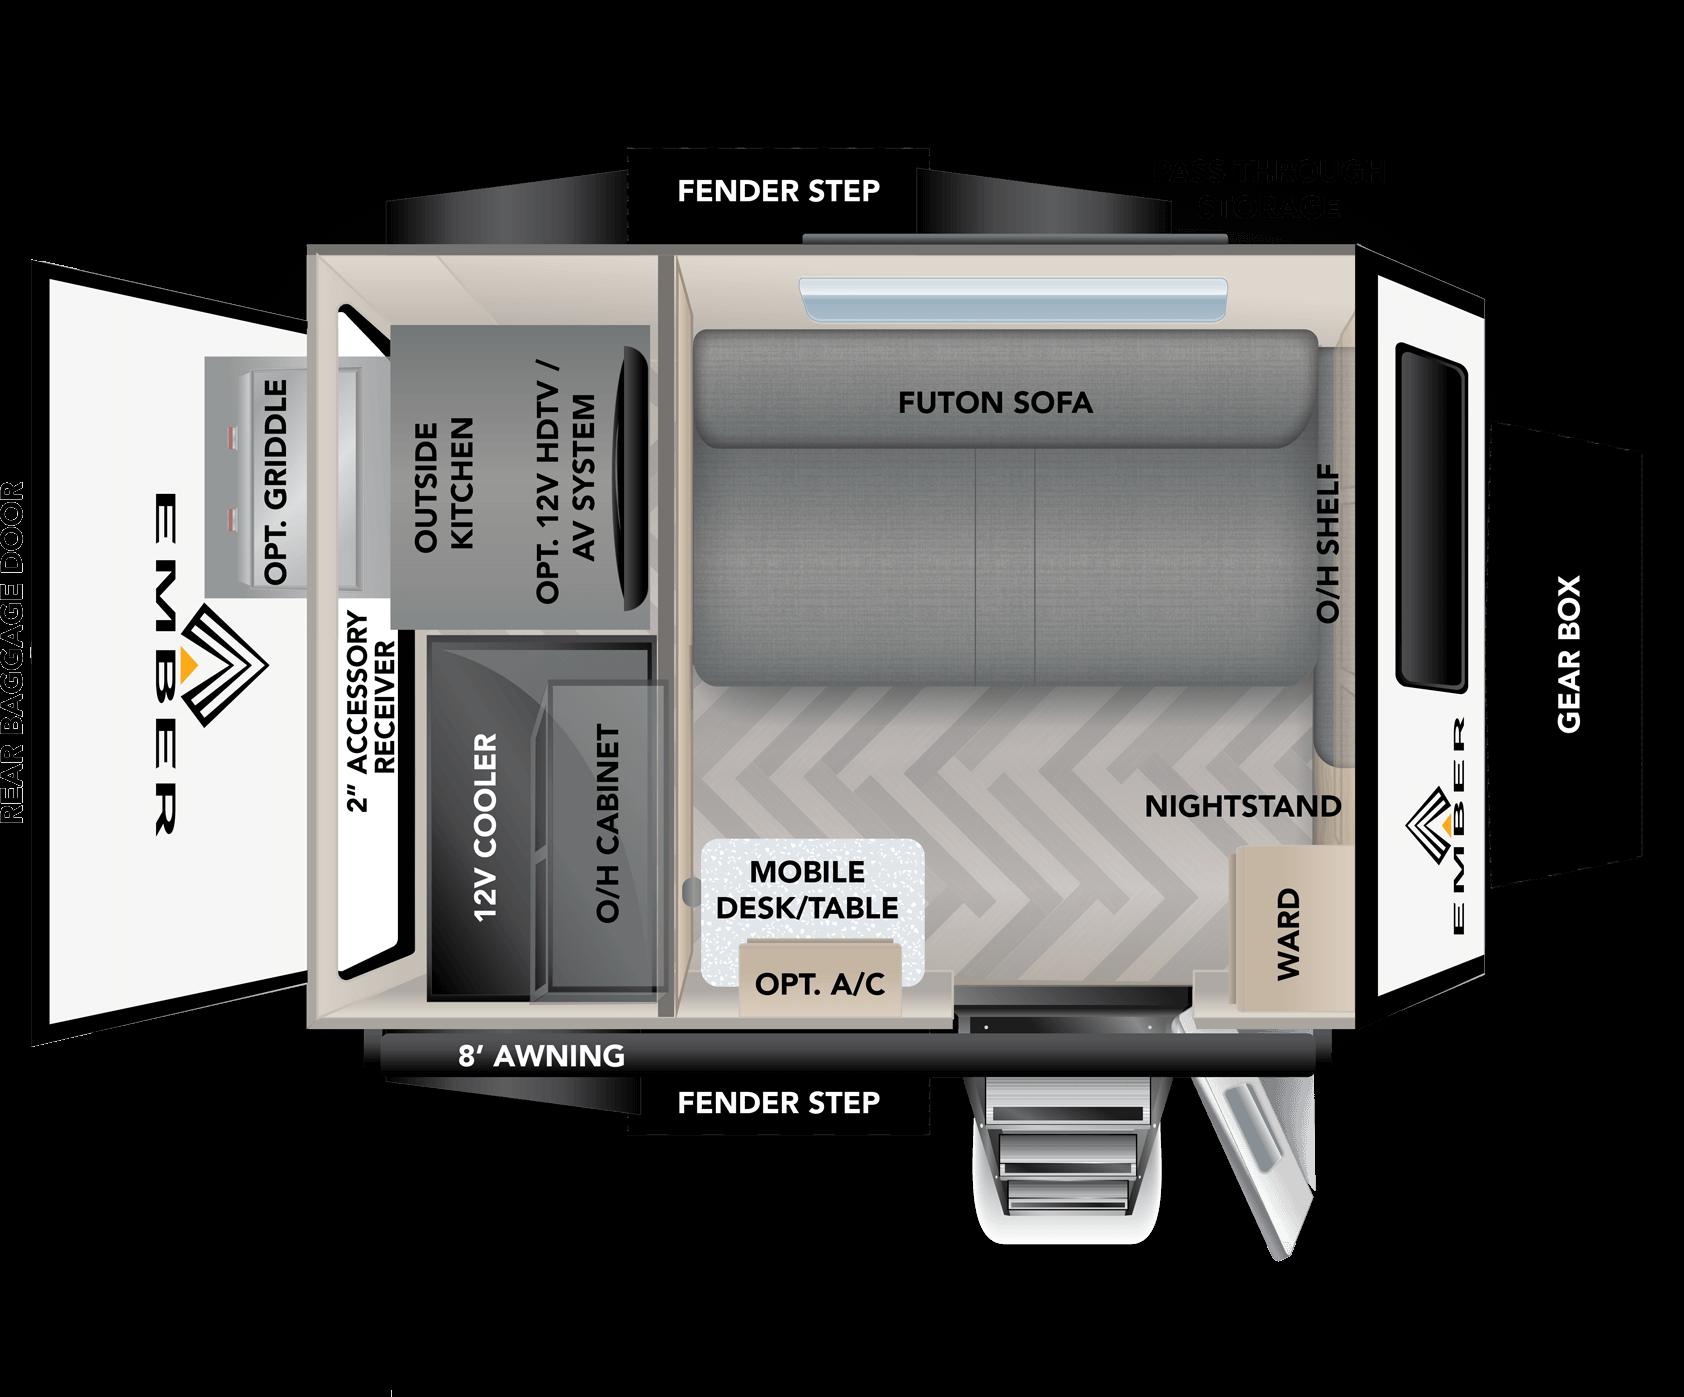 Floorplan image for ROK